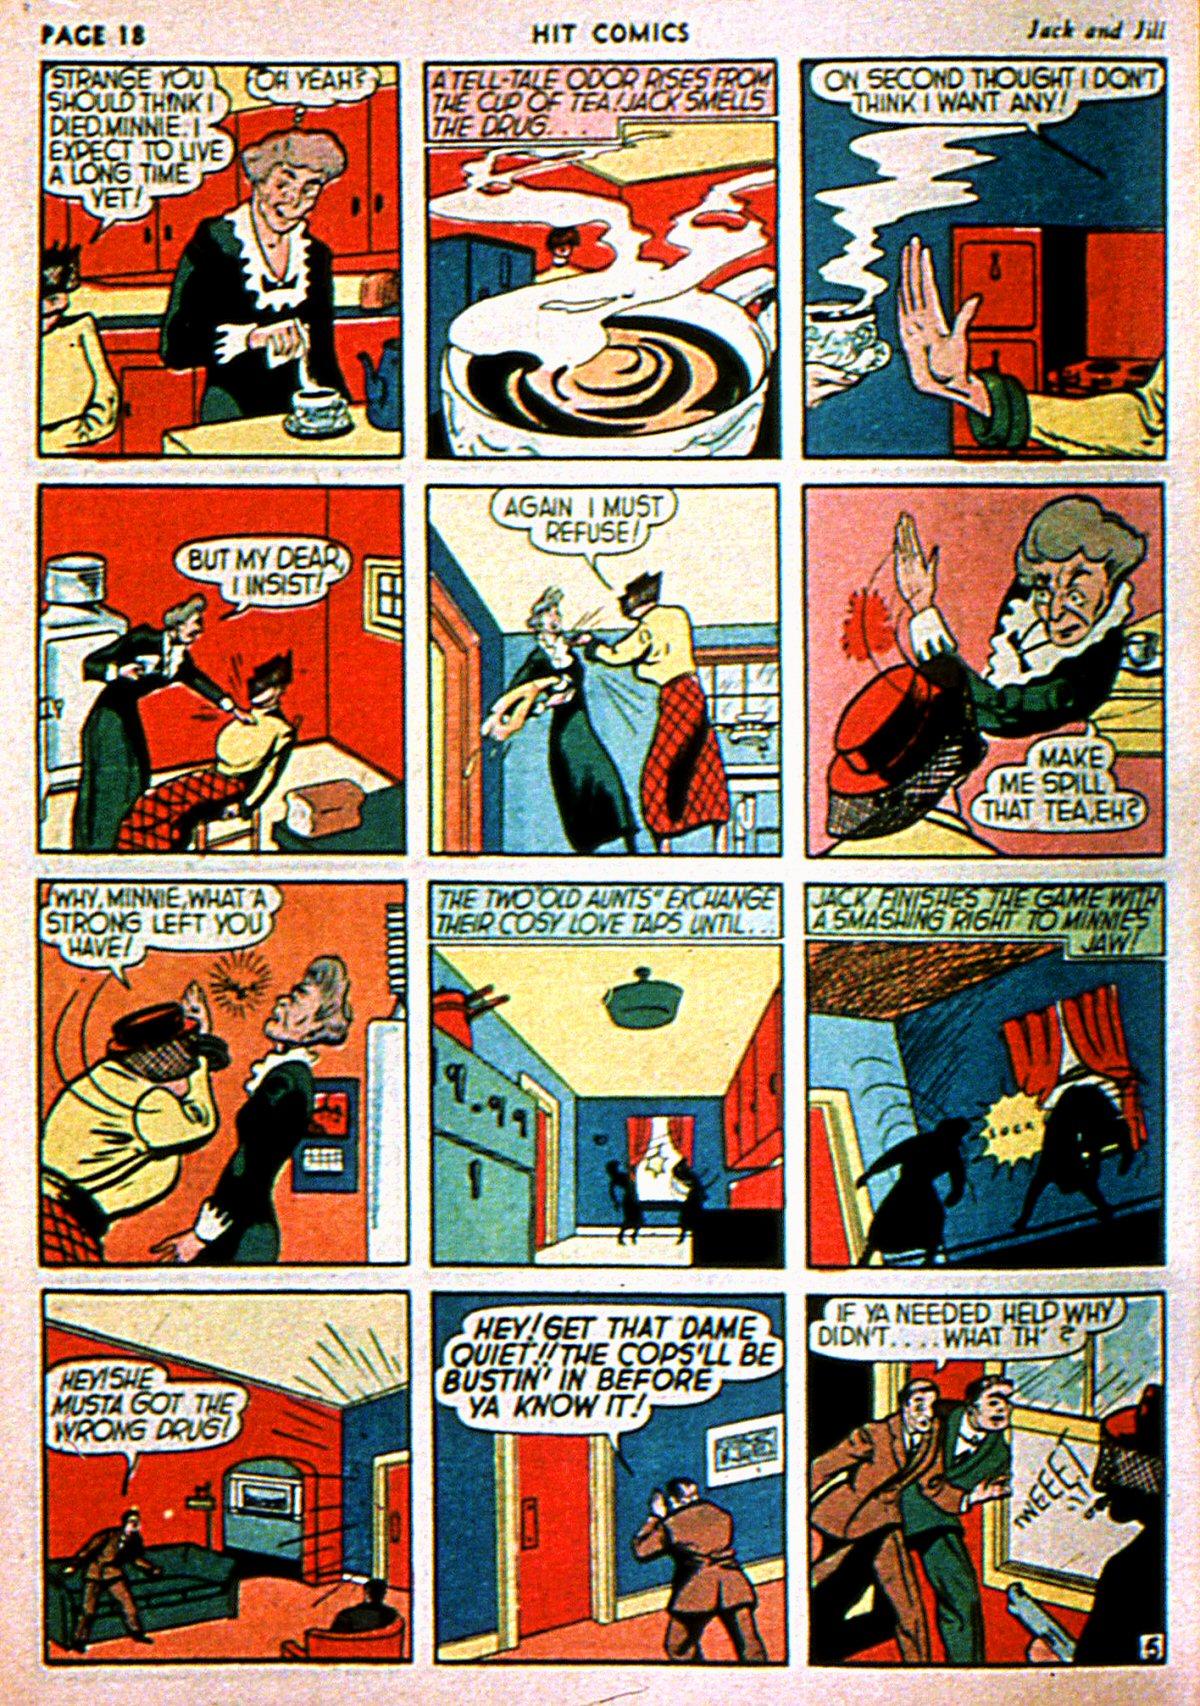 Read online Hit Comics comic -  Issue #3 - 20